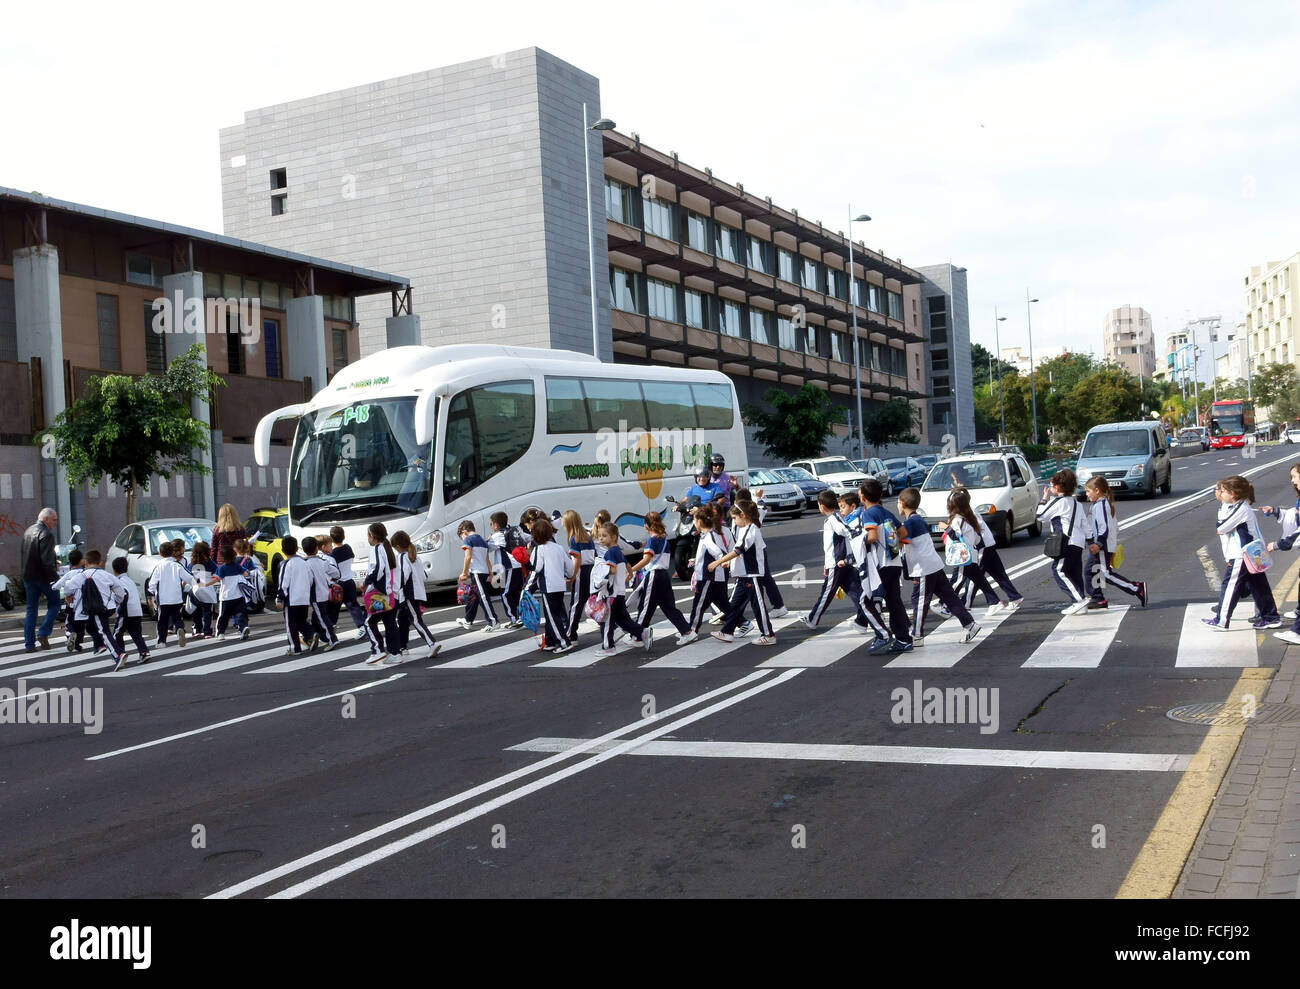 Schoolchildren cross road to waiting coach in Santa Cruz de Tenerife, Canary Islands, Spain - Stock Image